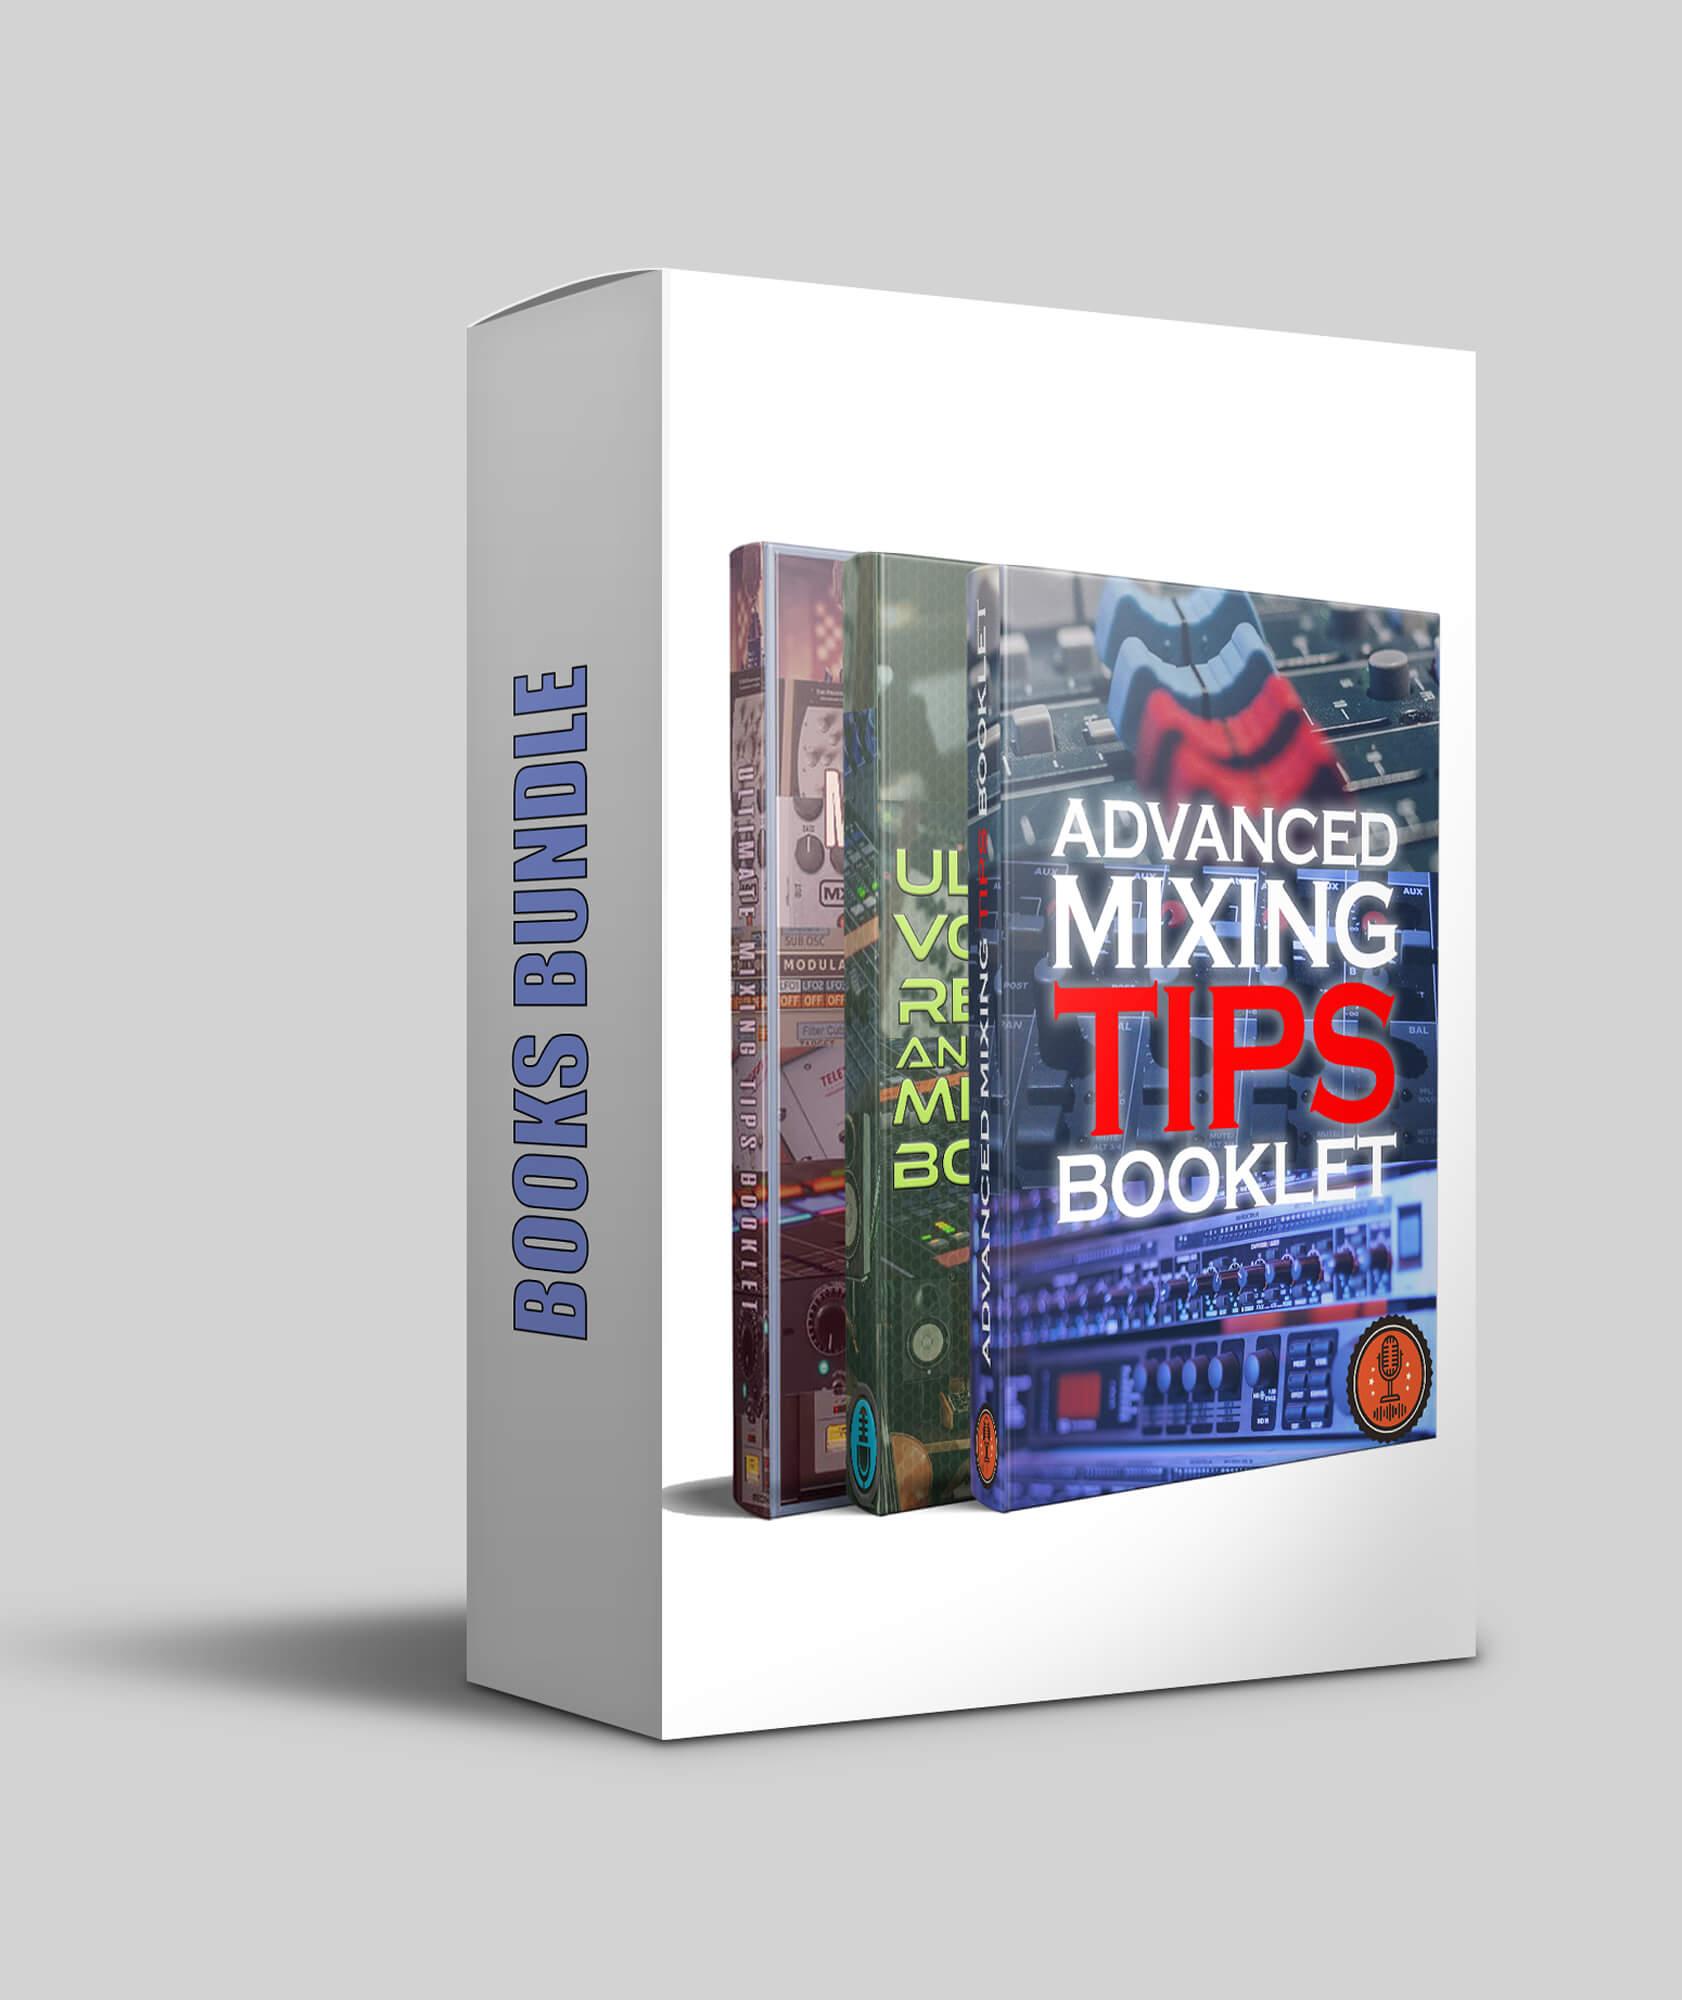 Ultimate Books Bundle